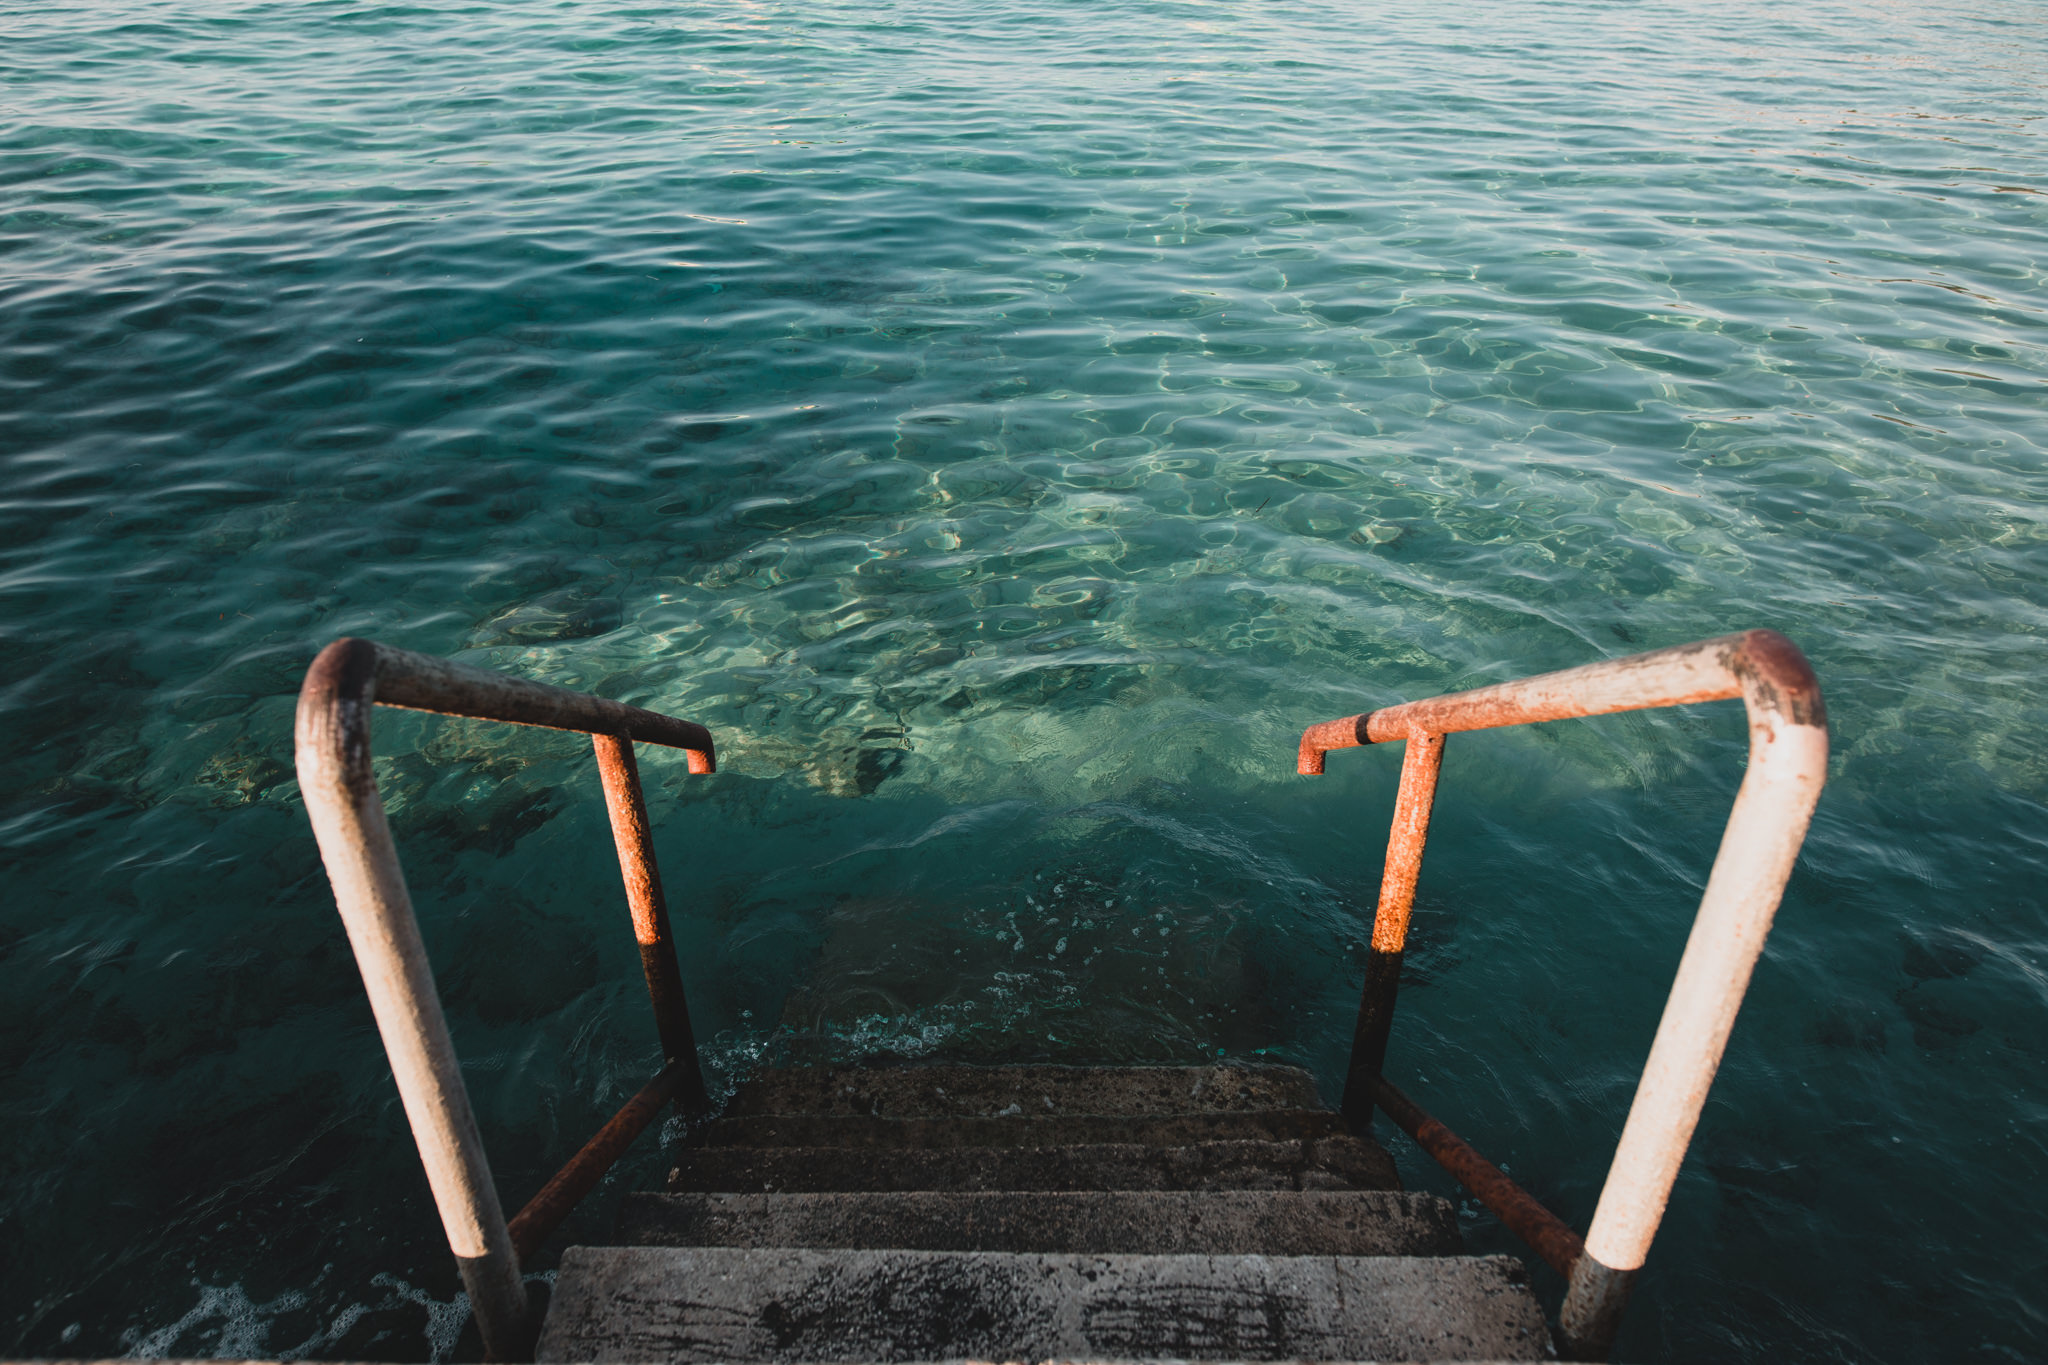 365-WEB-Jonathan-Kuhn-Photography-Croatia-1858.jpg